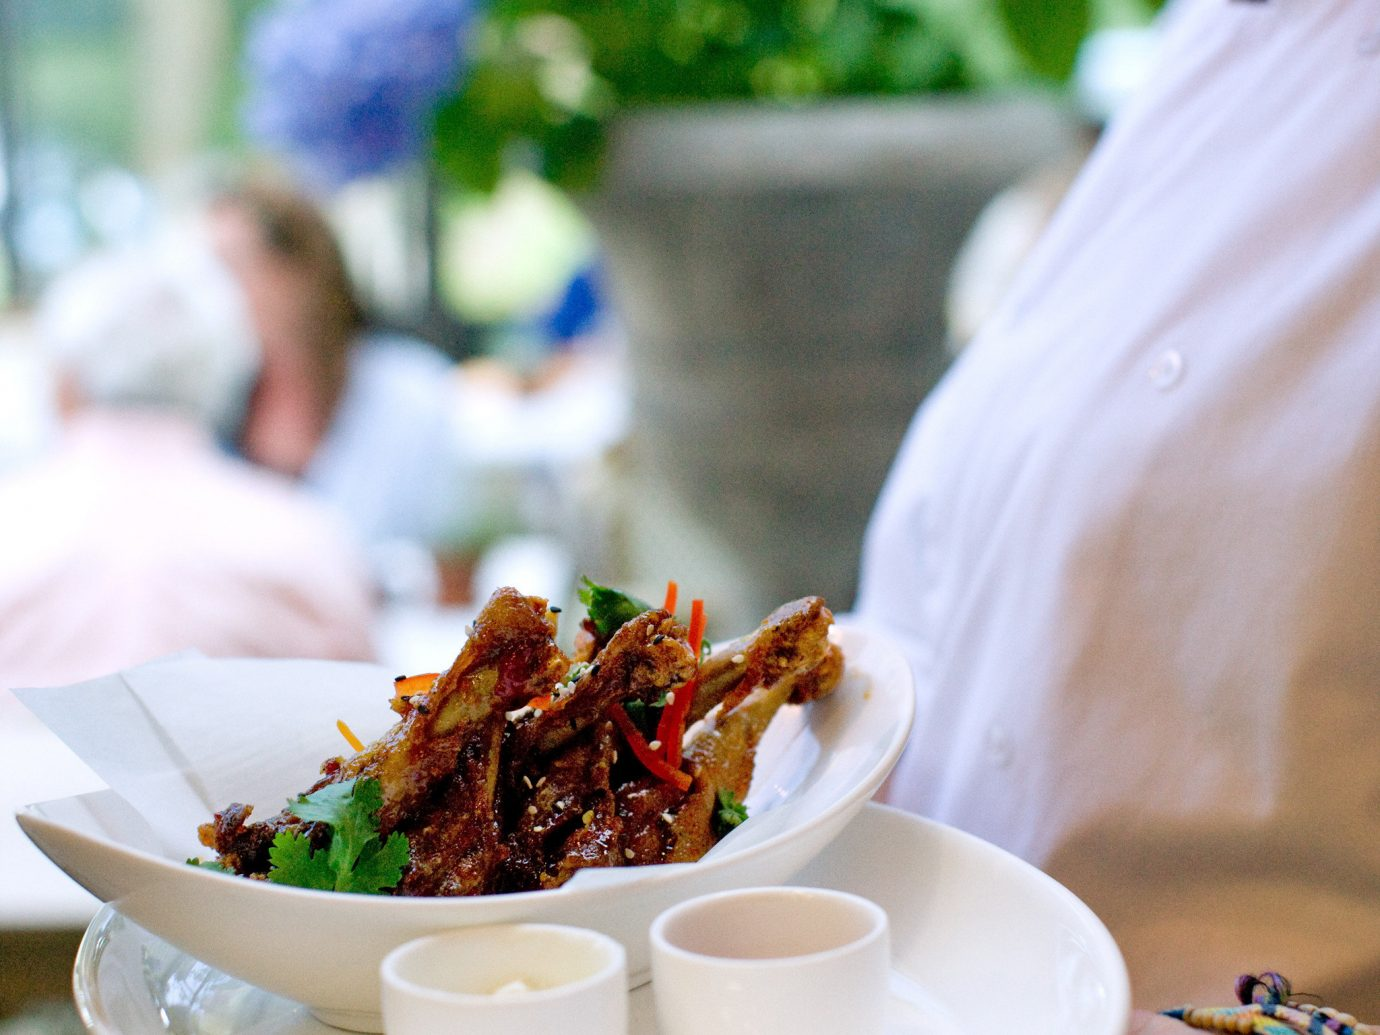 Travel Tips person human action meal lunch dish food restaurant sense dinner brunch eating flower